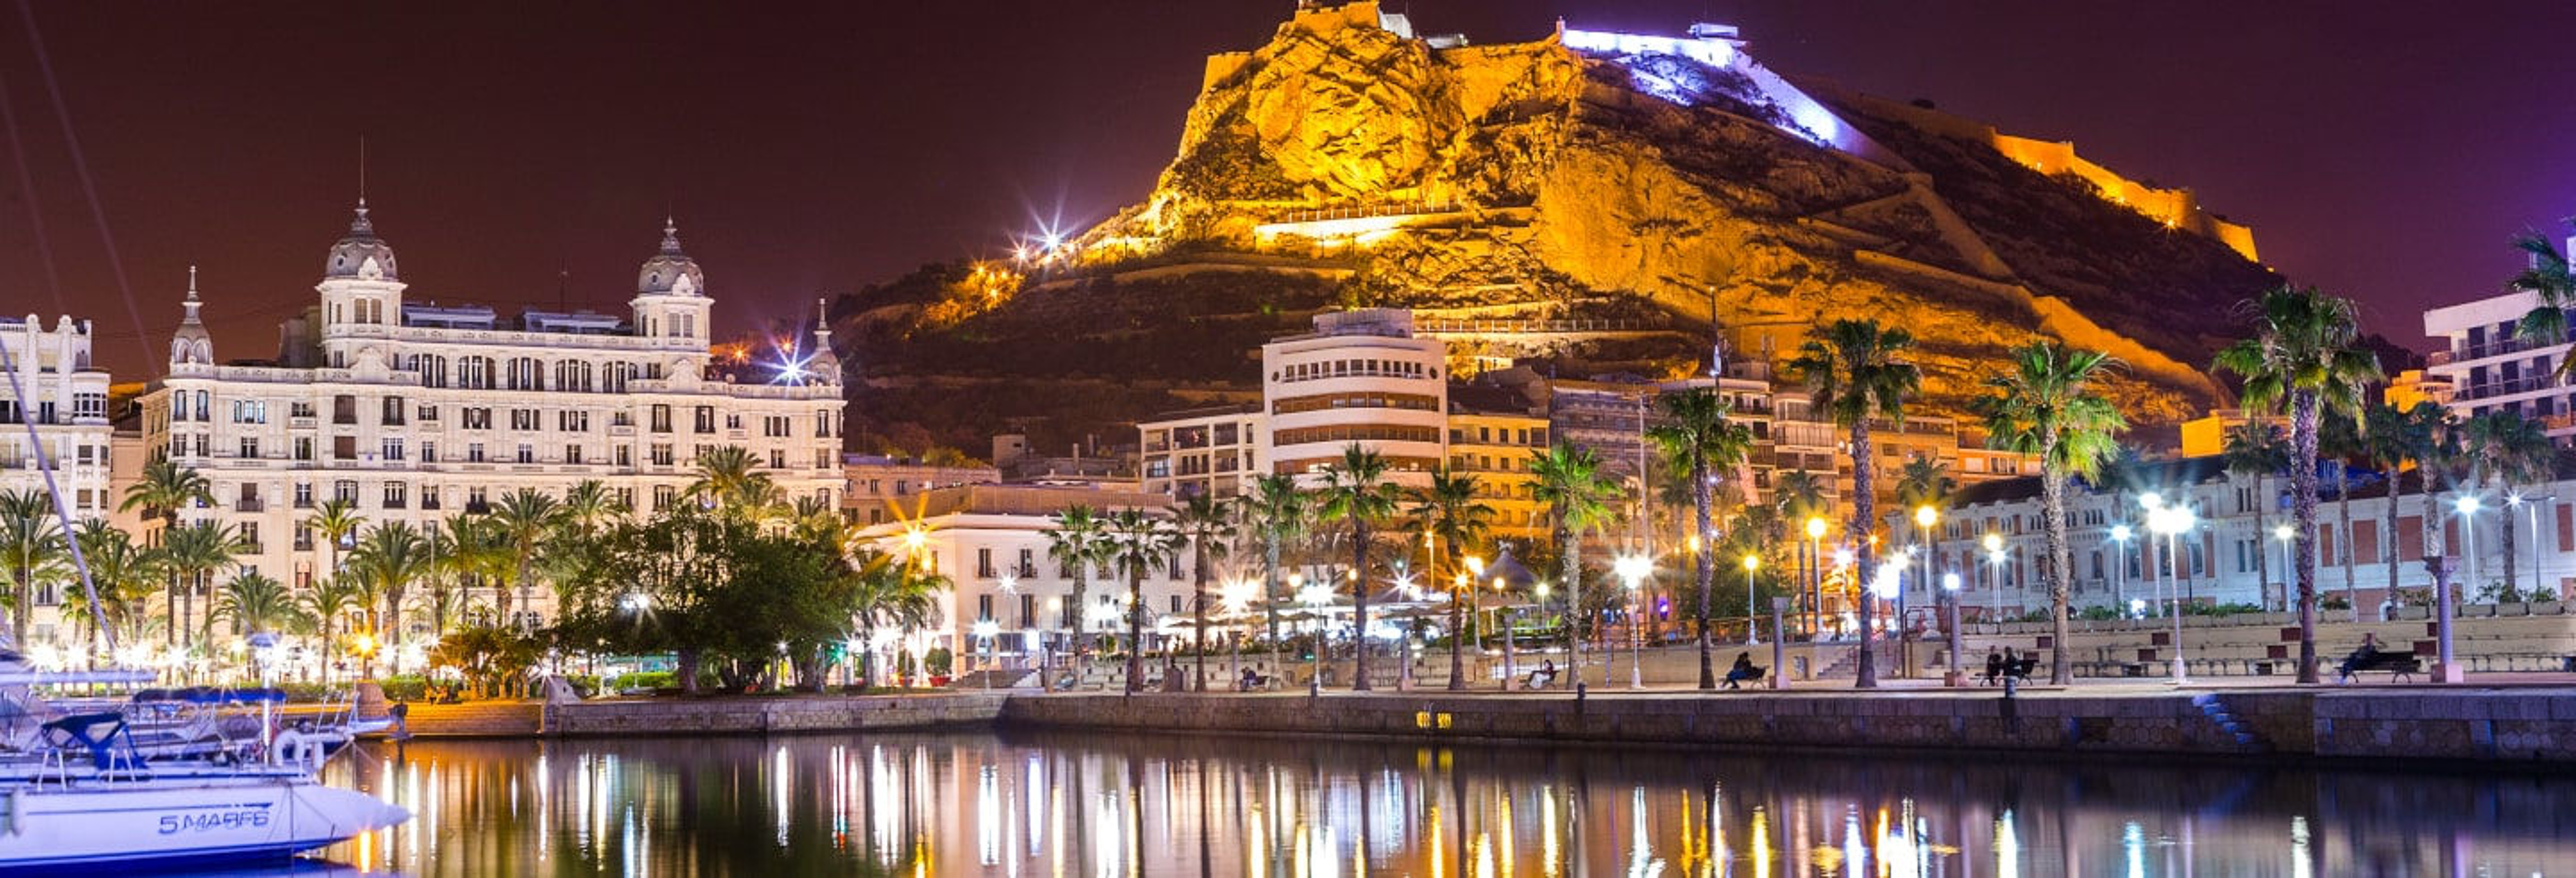 Free tour dos mistérios e lendas de Alicante